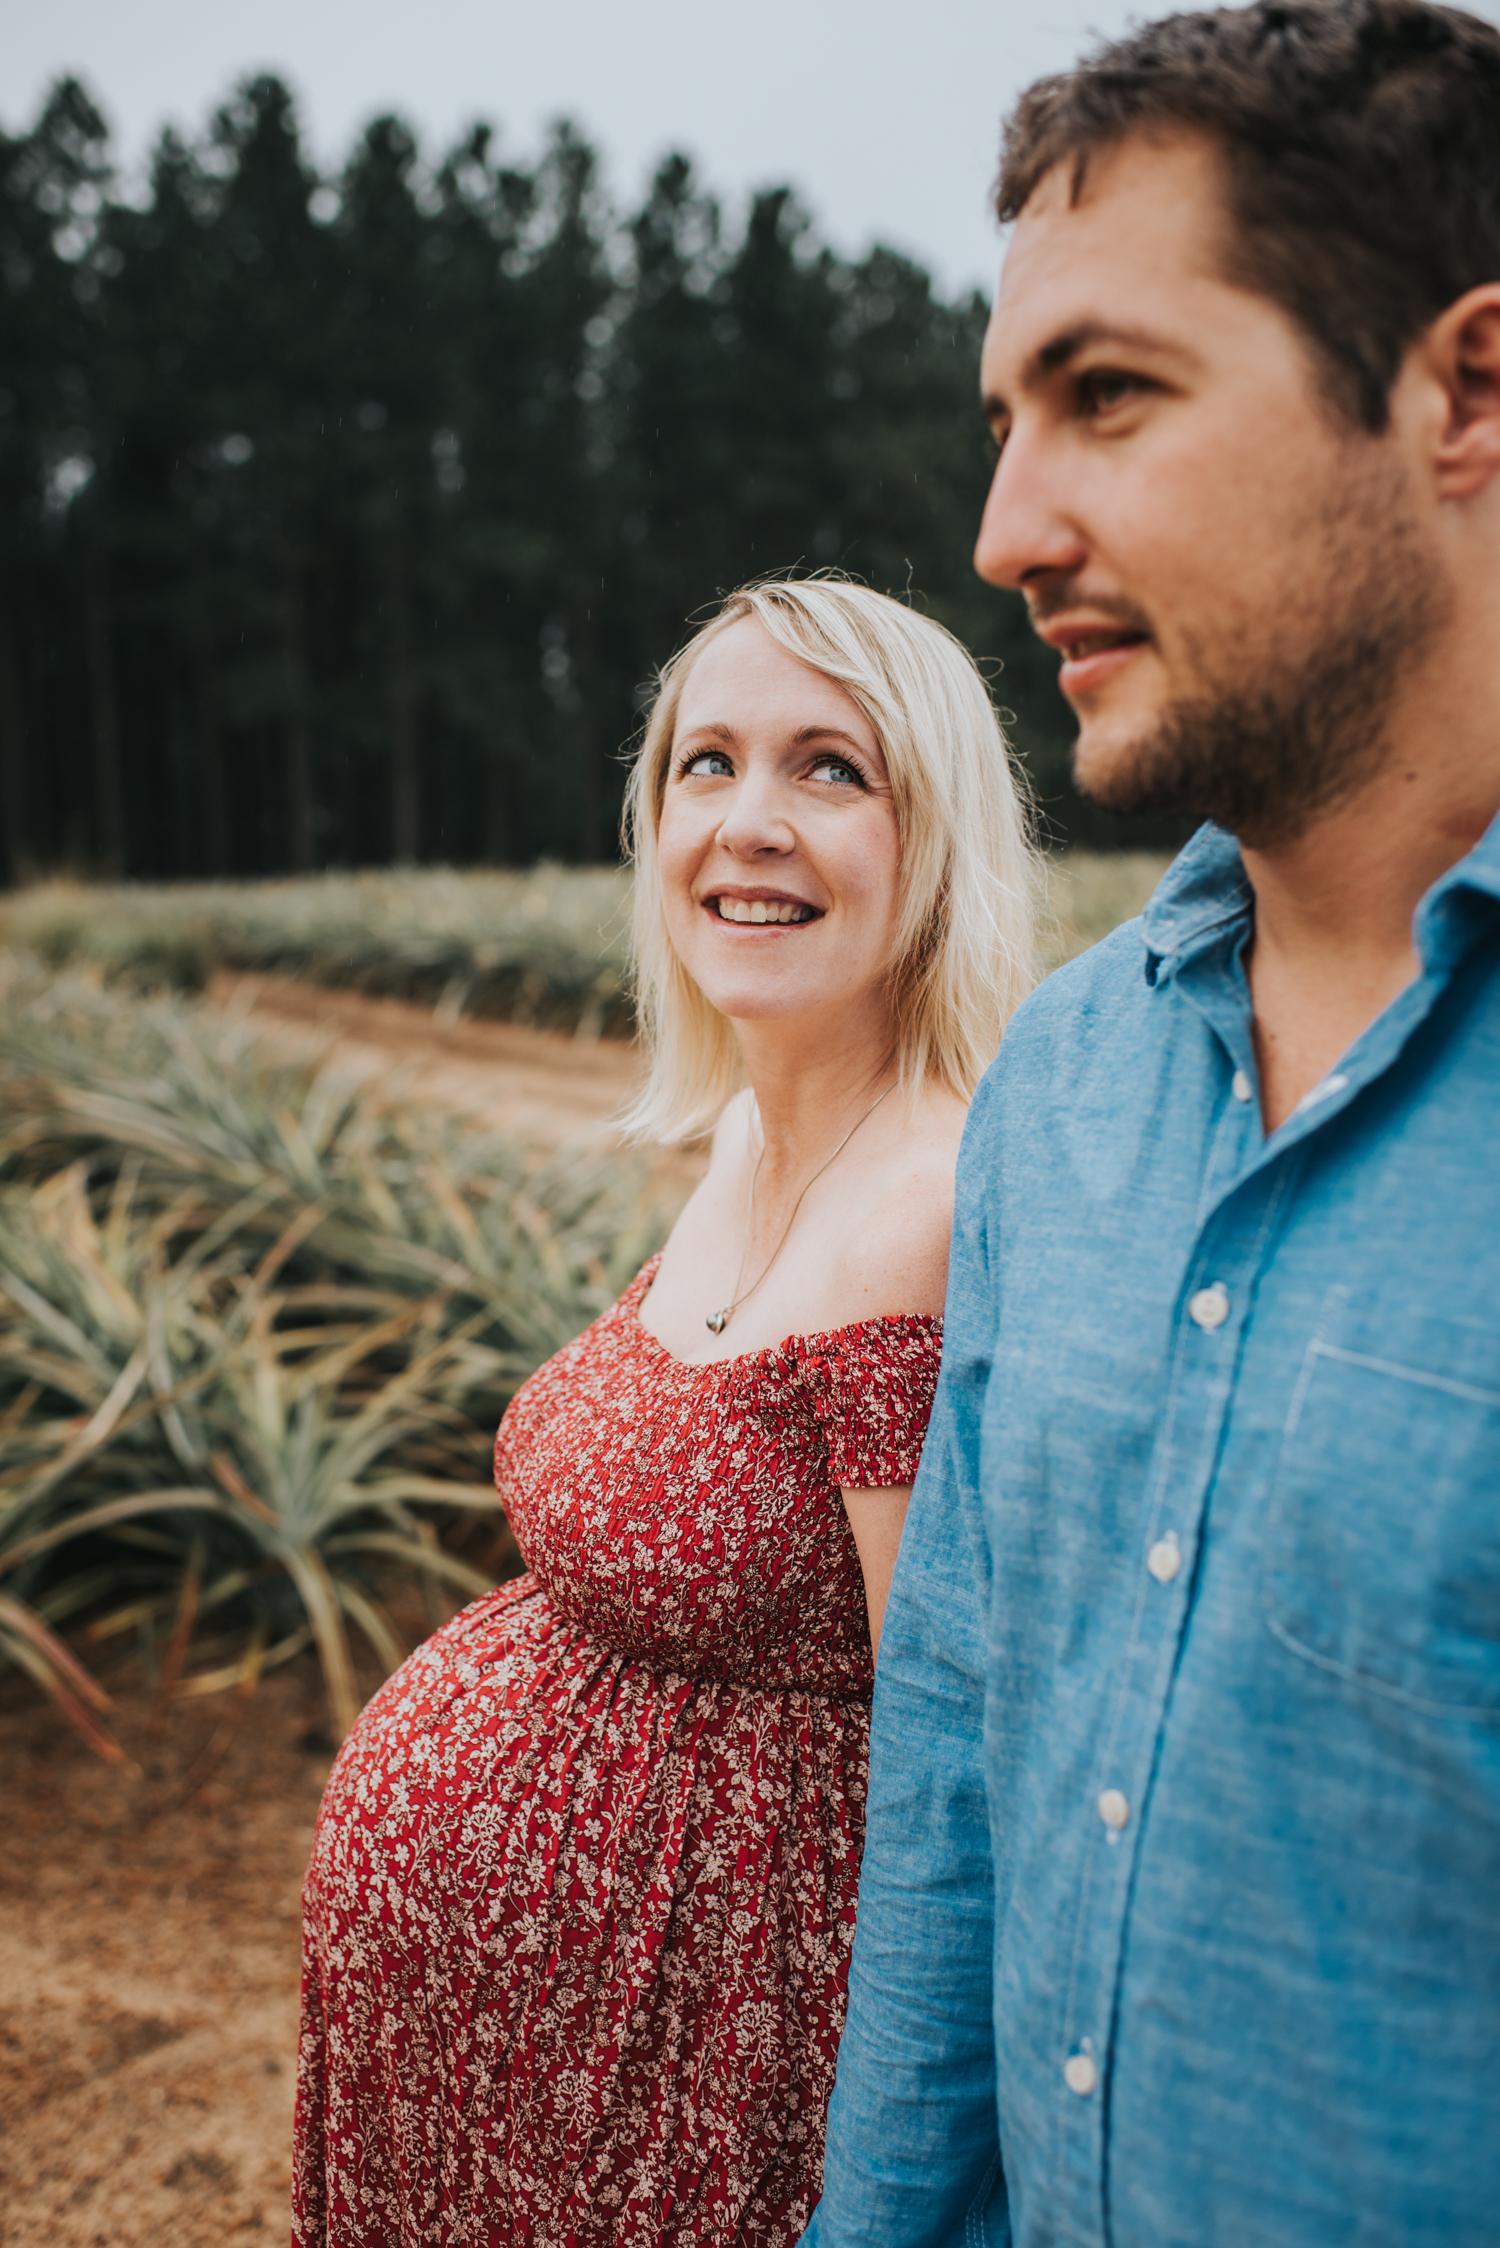 Brisbane Maternity Photographer | Newborn Photography-8.jpg